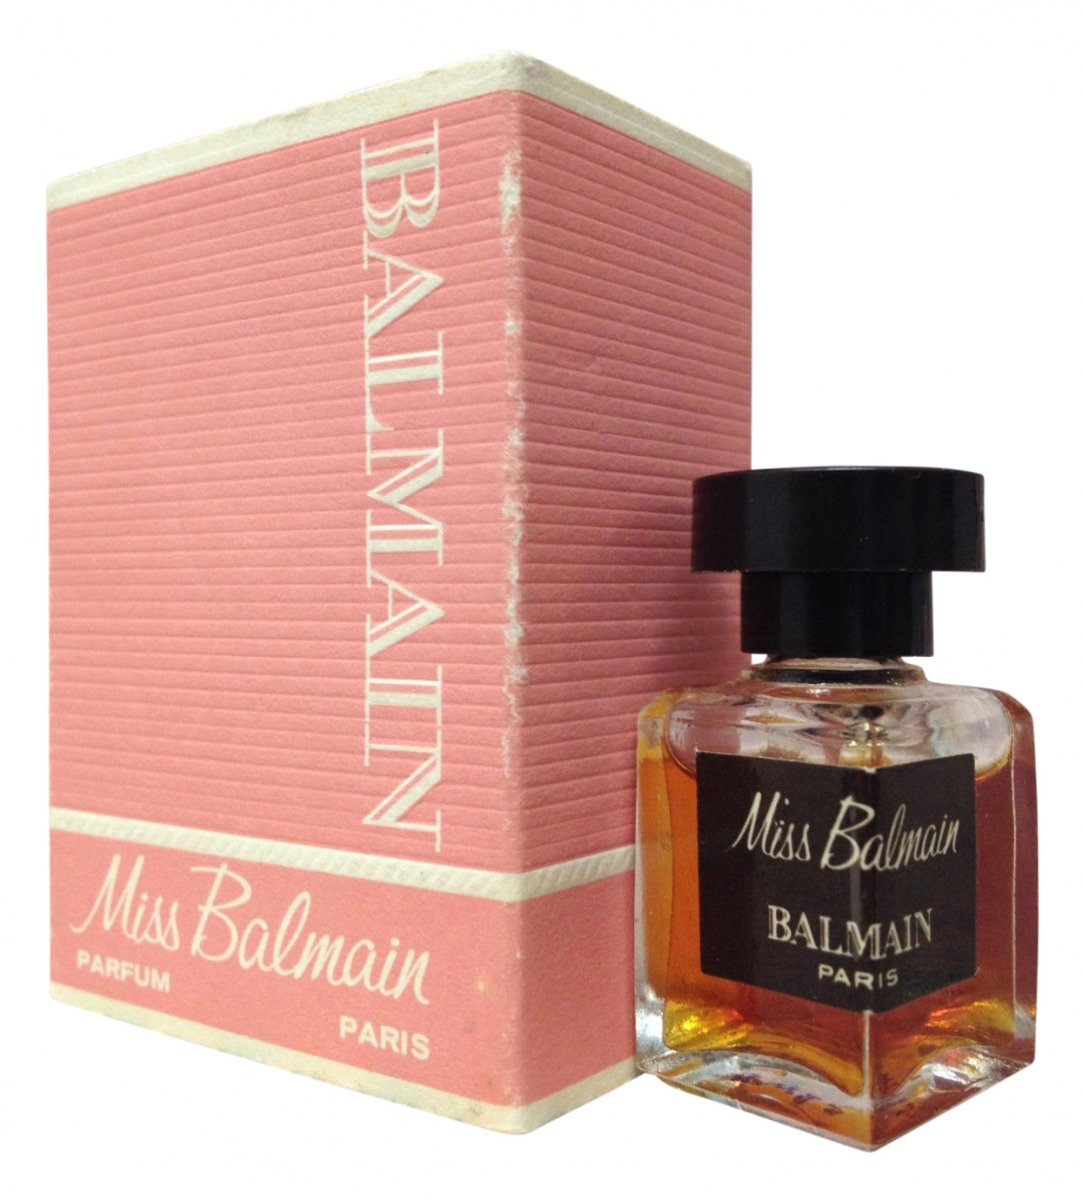 balmain pierre balmain miss balmain parfum duftbeschreibung. Black Bedroom Furniture Sets. Home Design Ideas